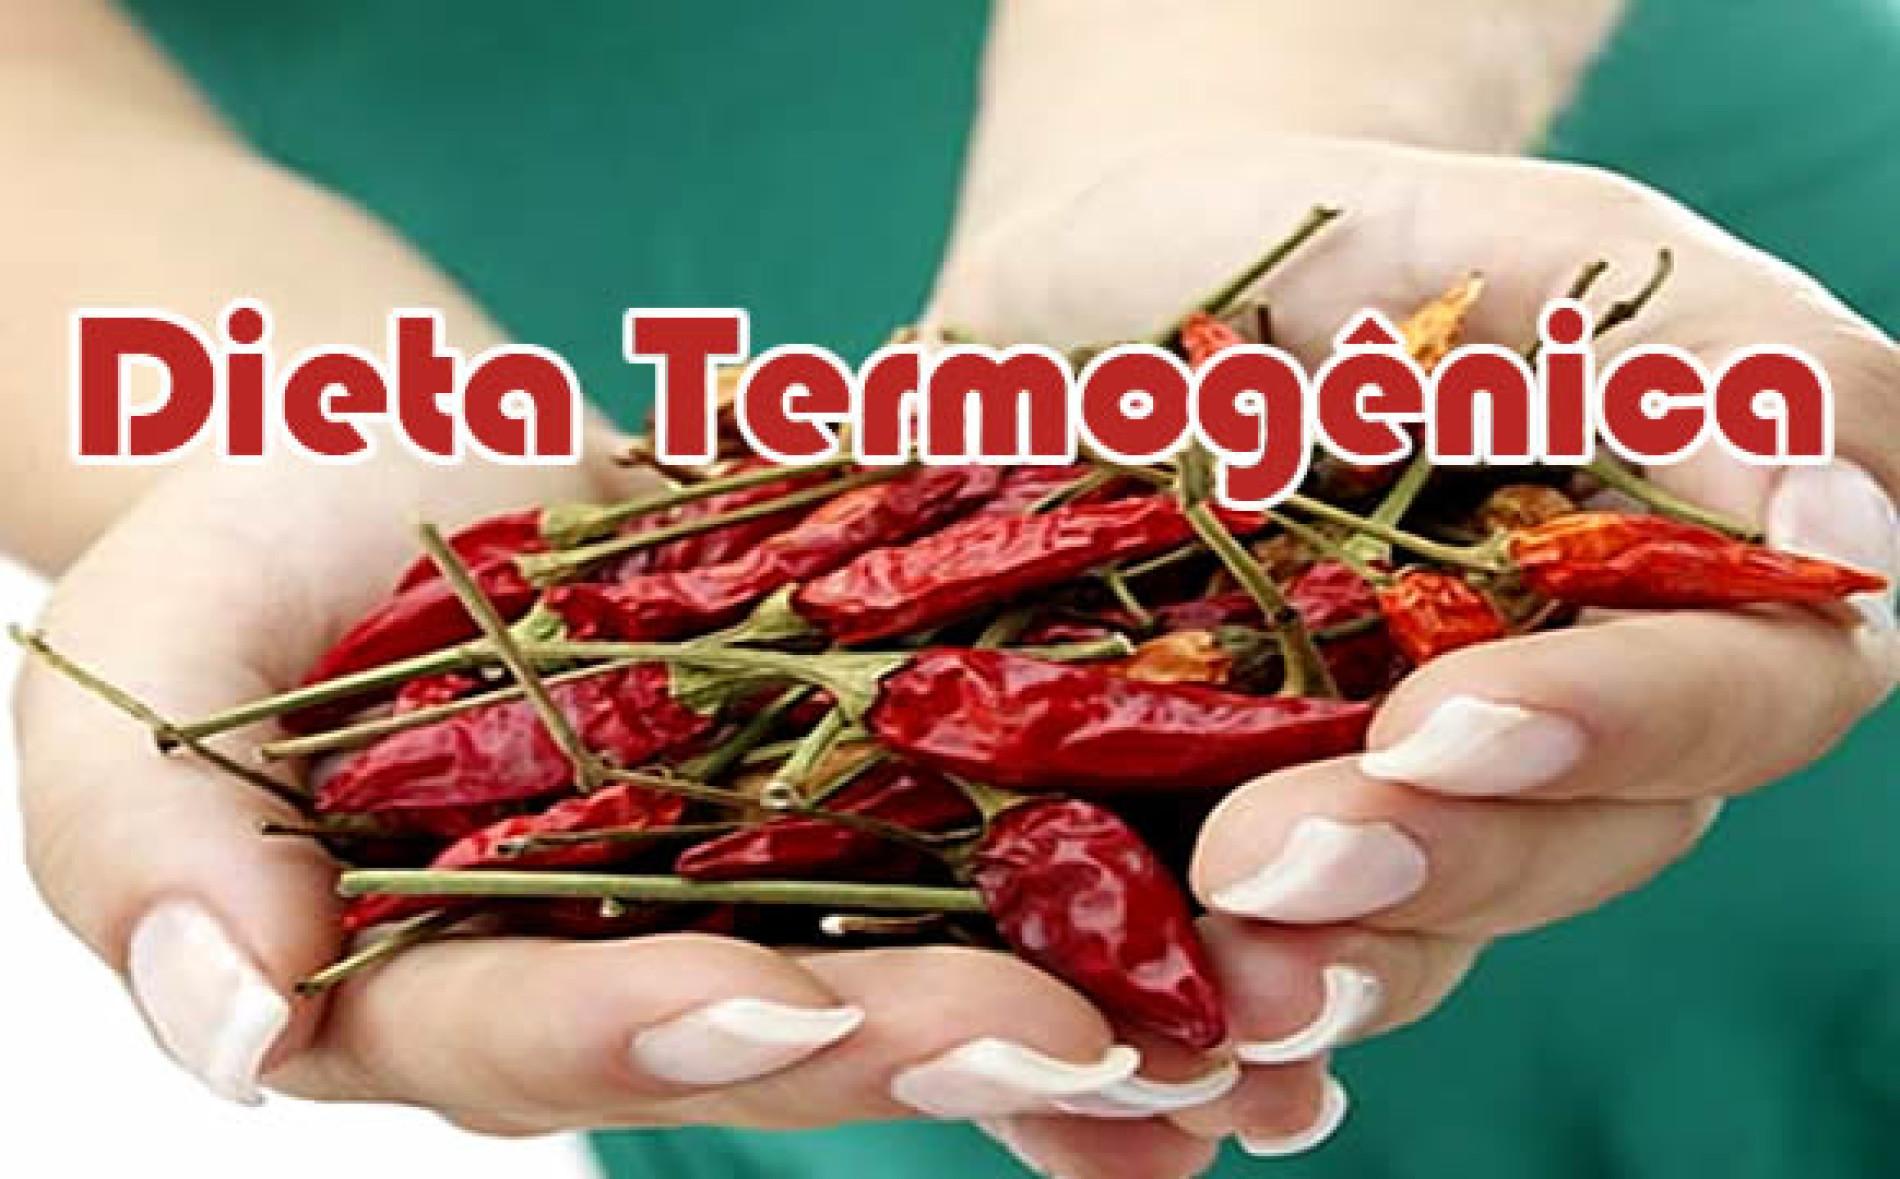 Dieta termogênica